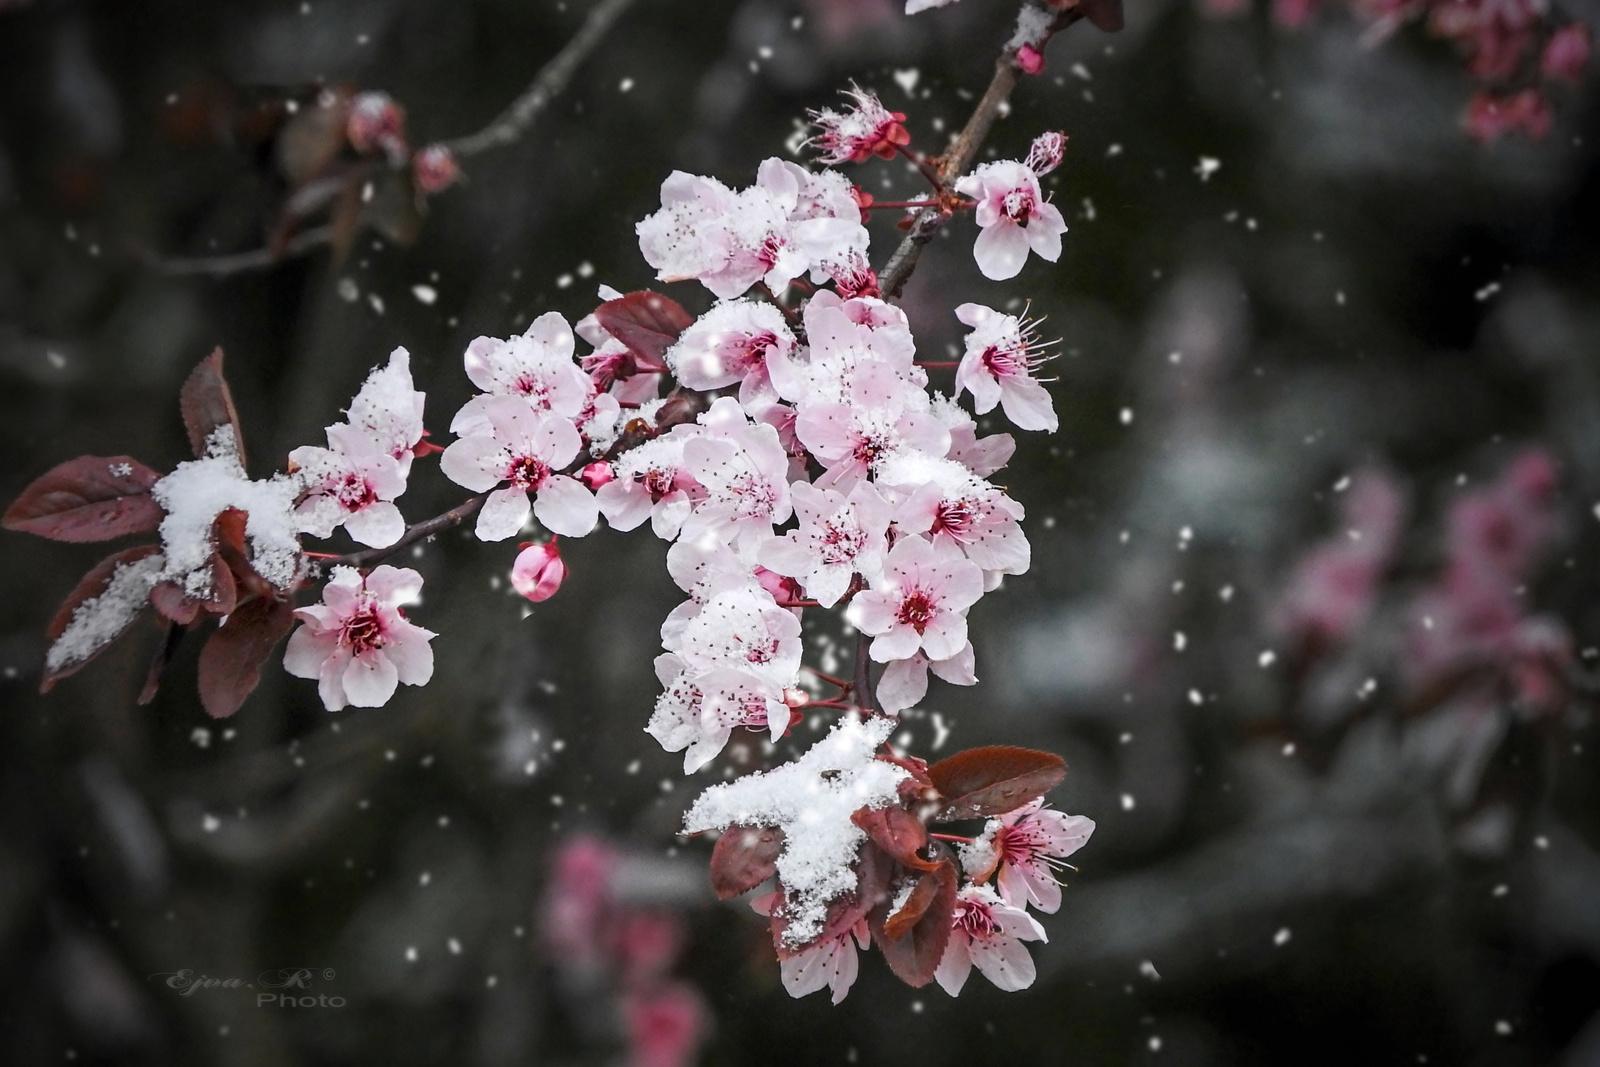 Hópihés virágok